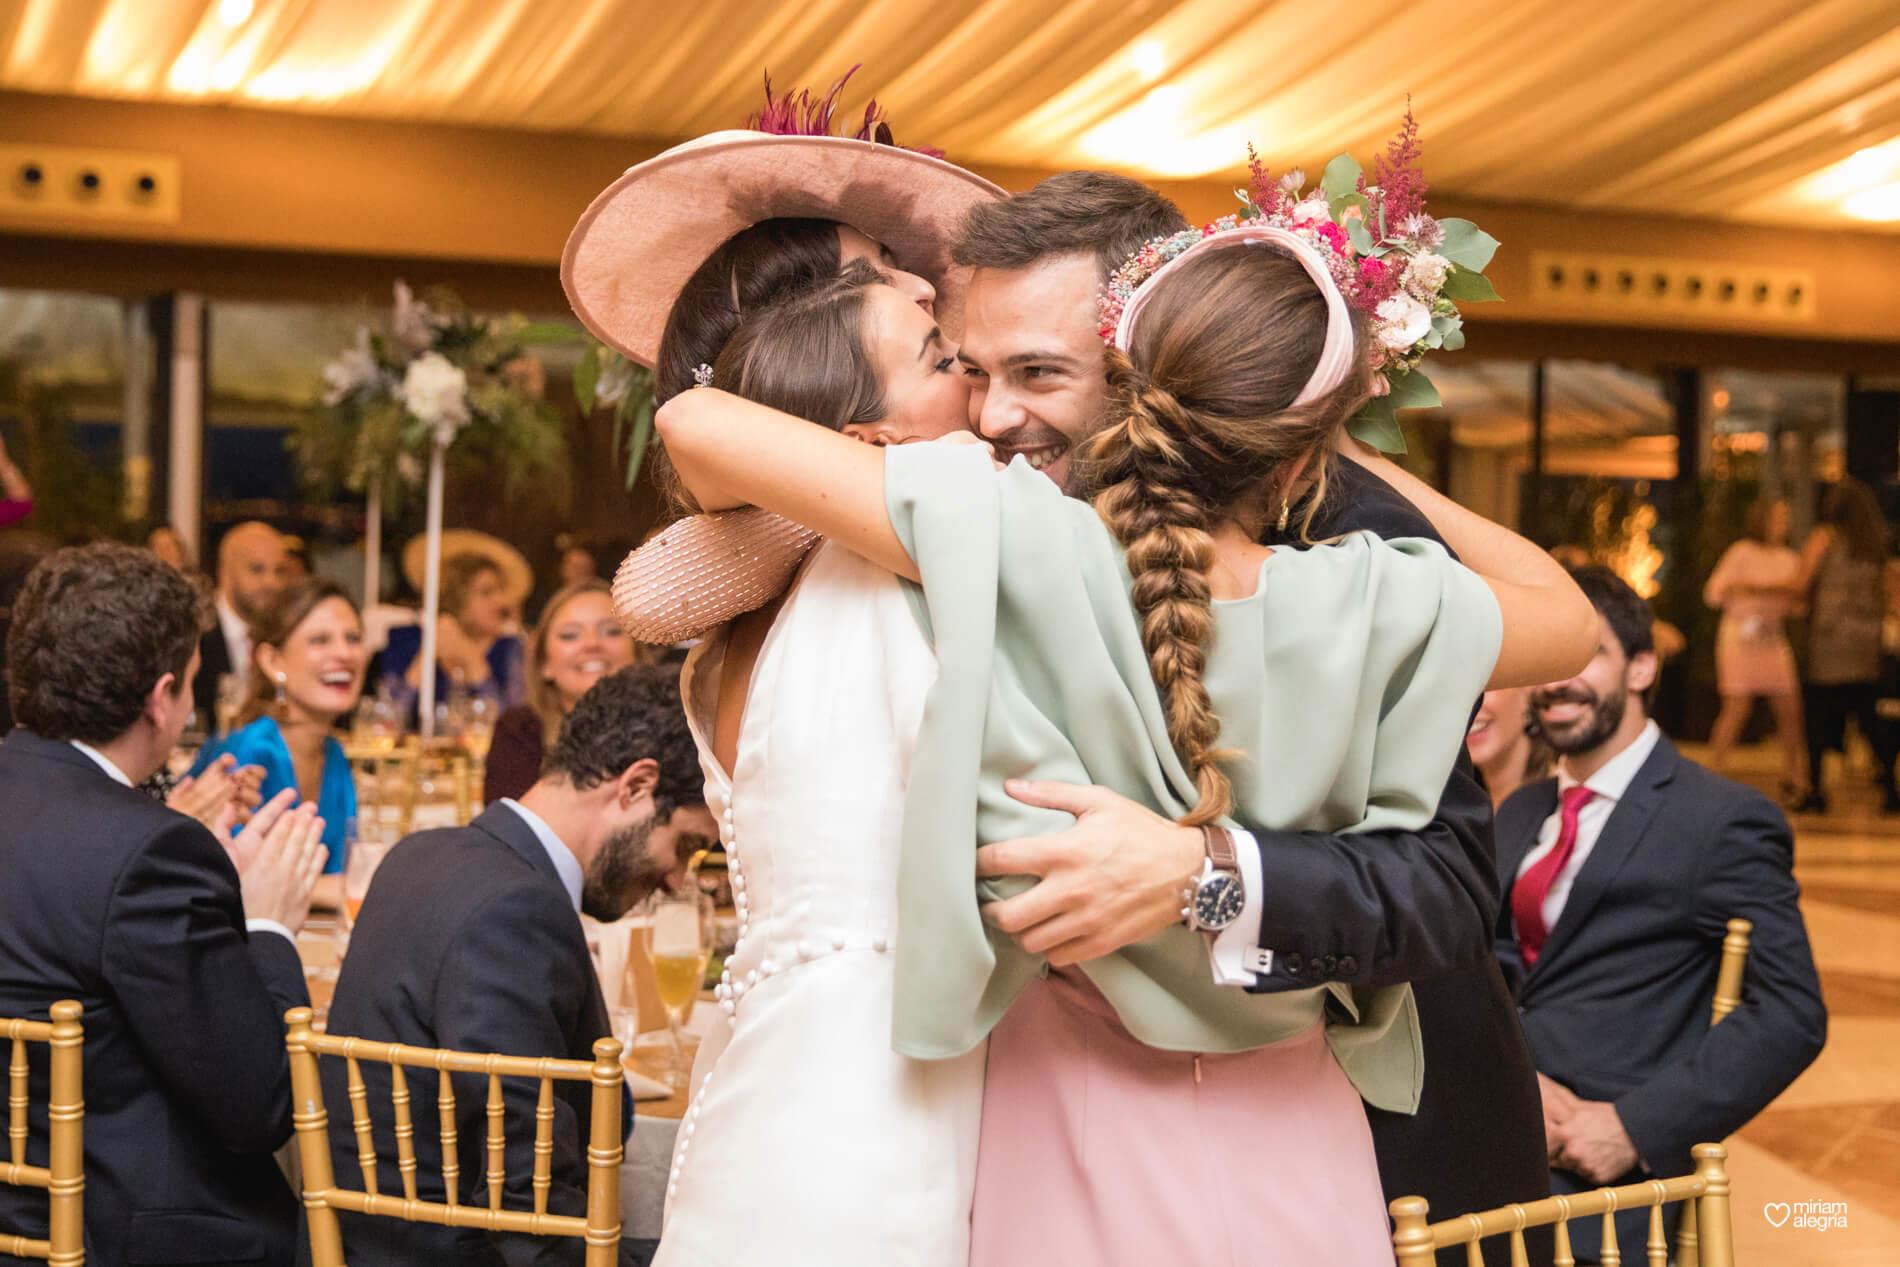 vestido-de-novia-paula-del-vas-miriam-alegria-fotografos-boda-murcia-130